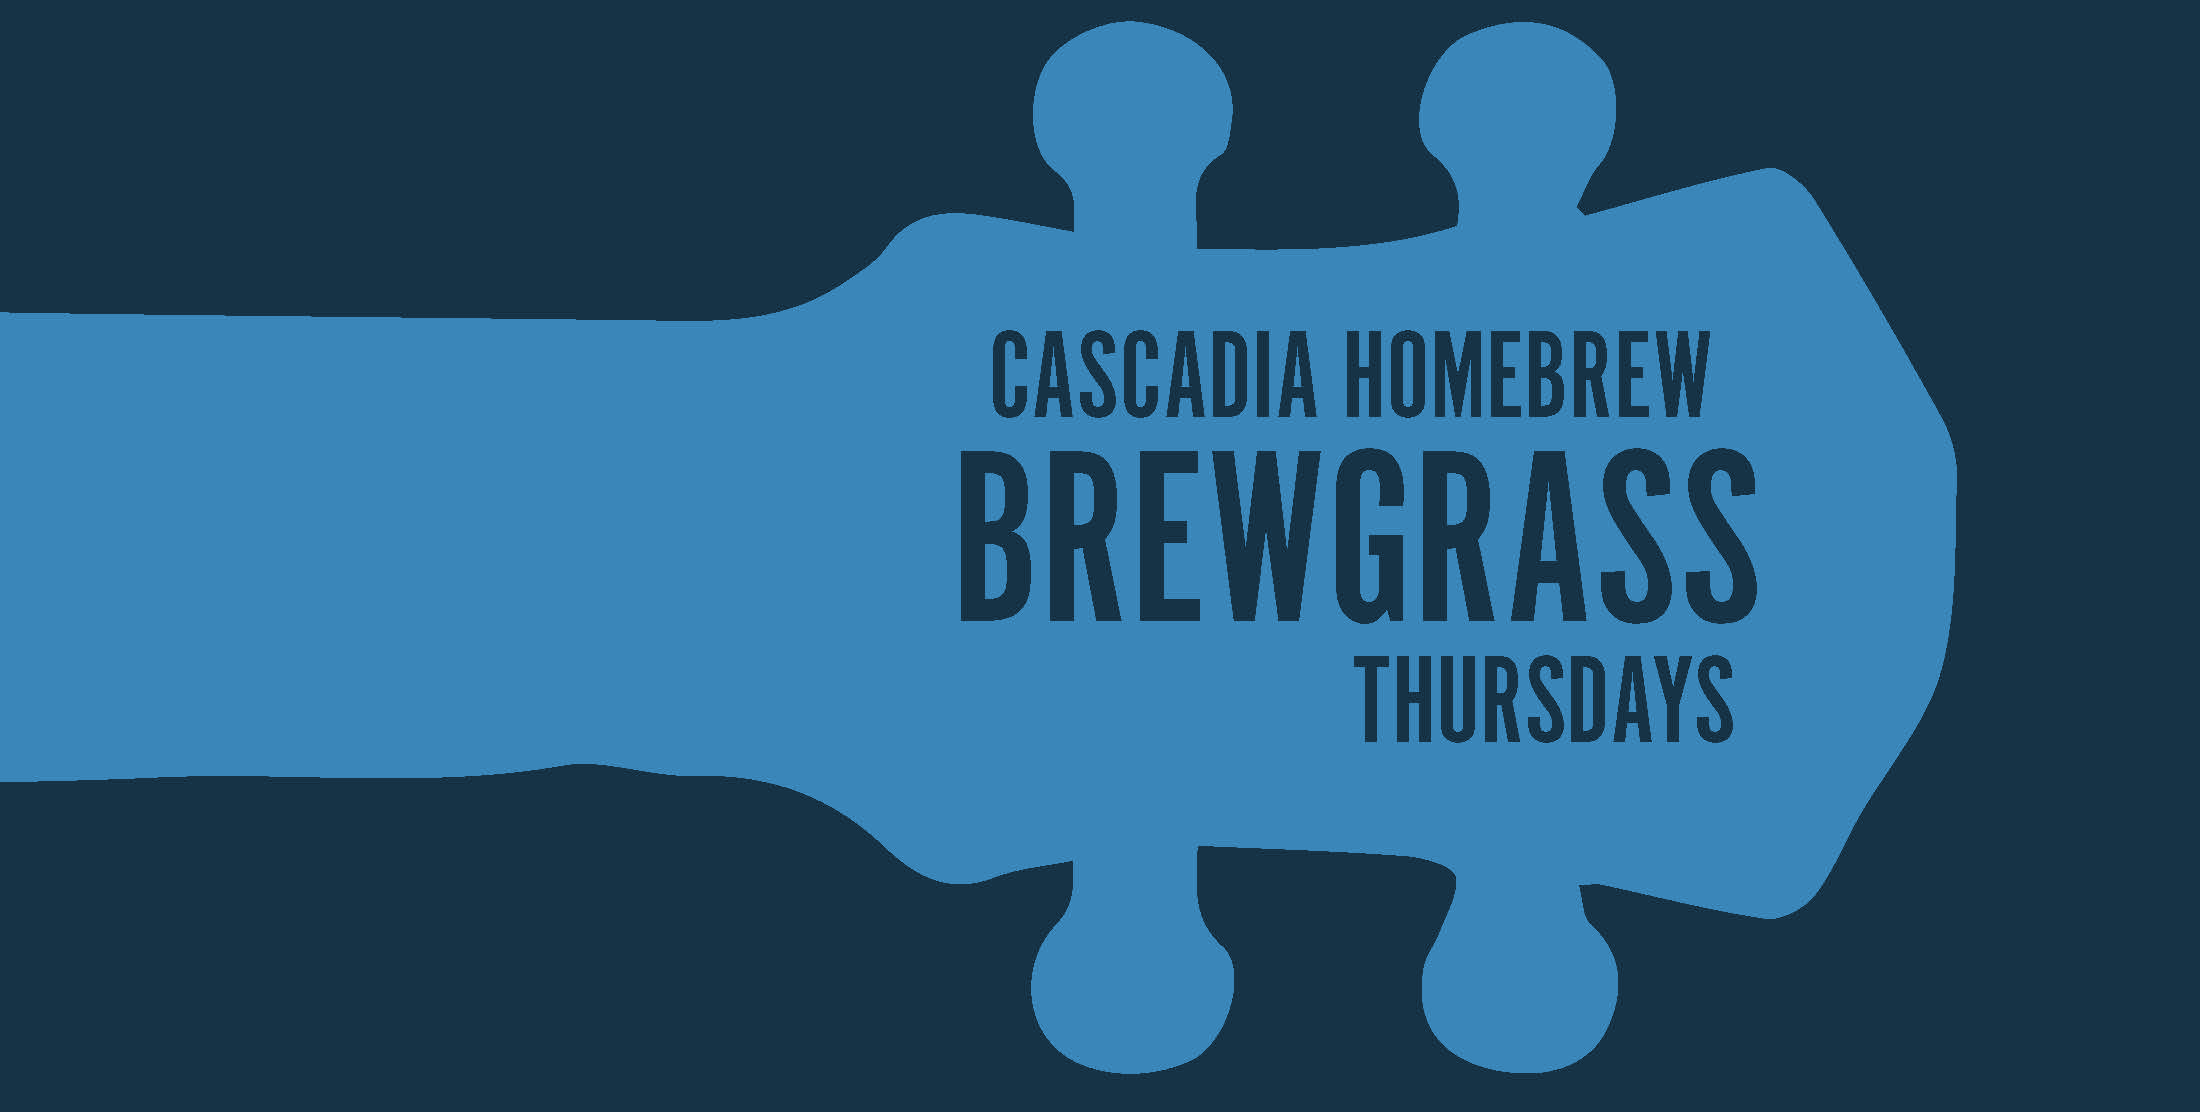 brewgrassthursdays.jpg